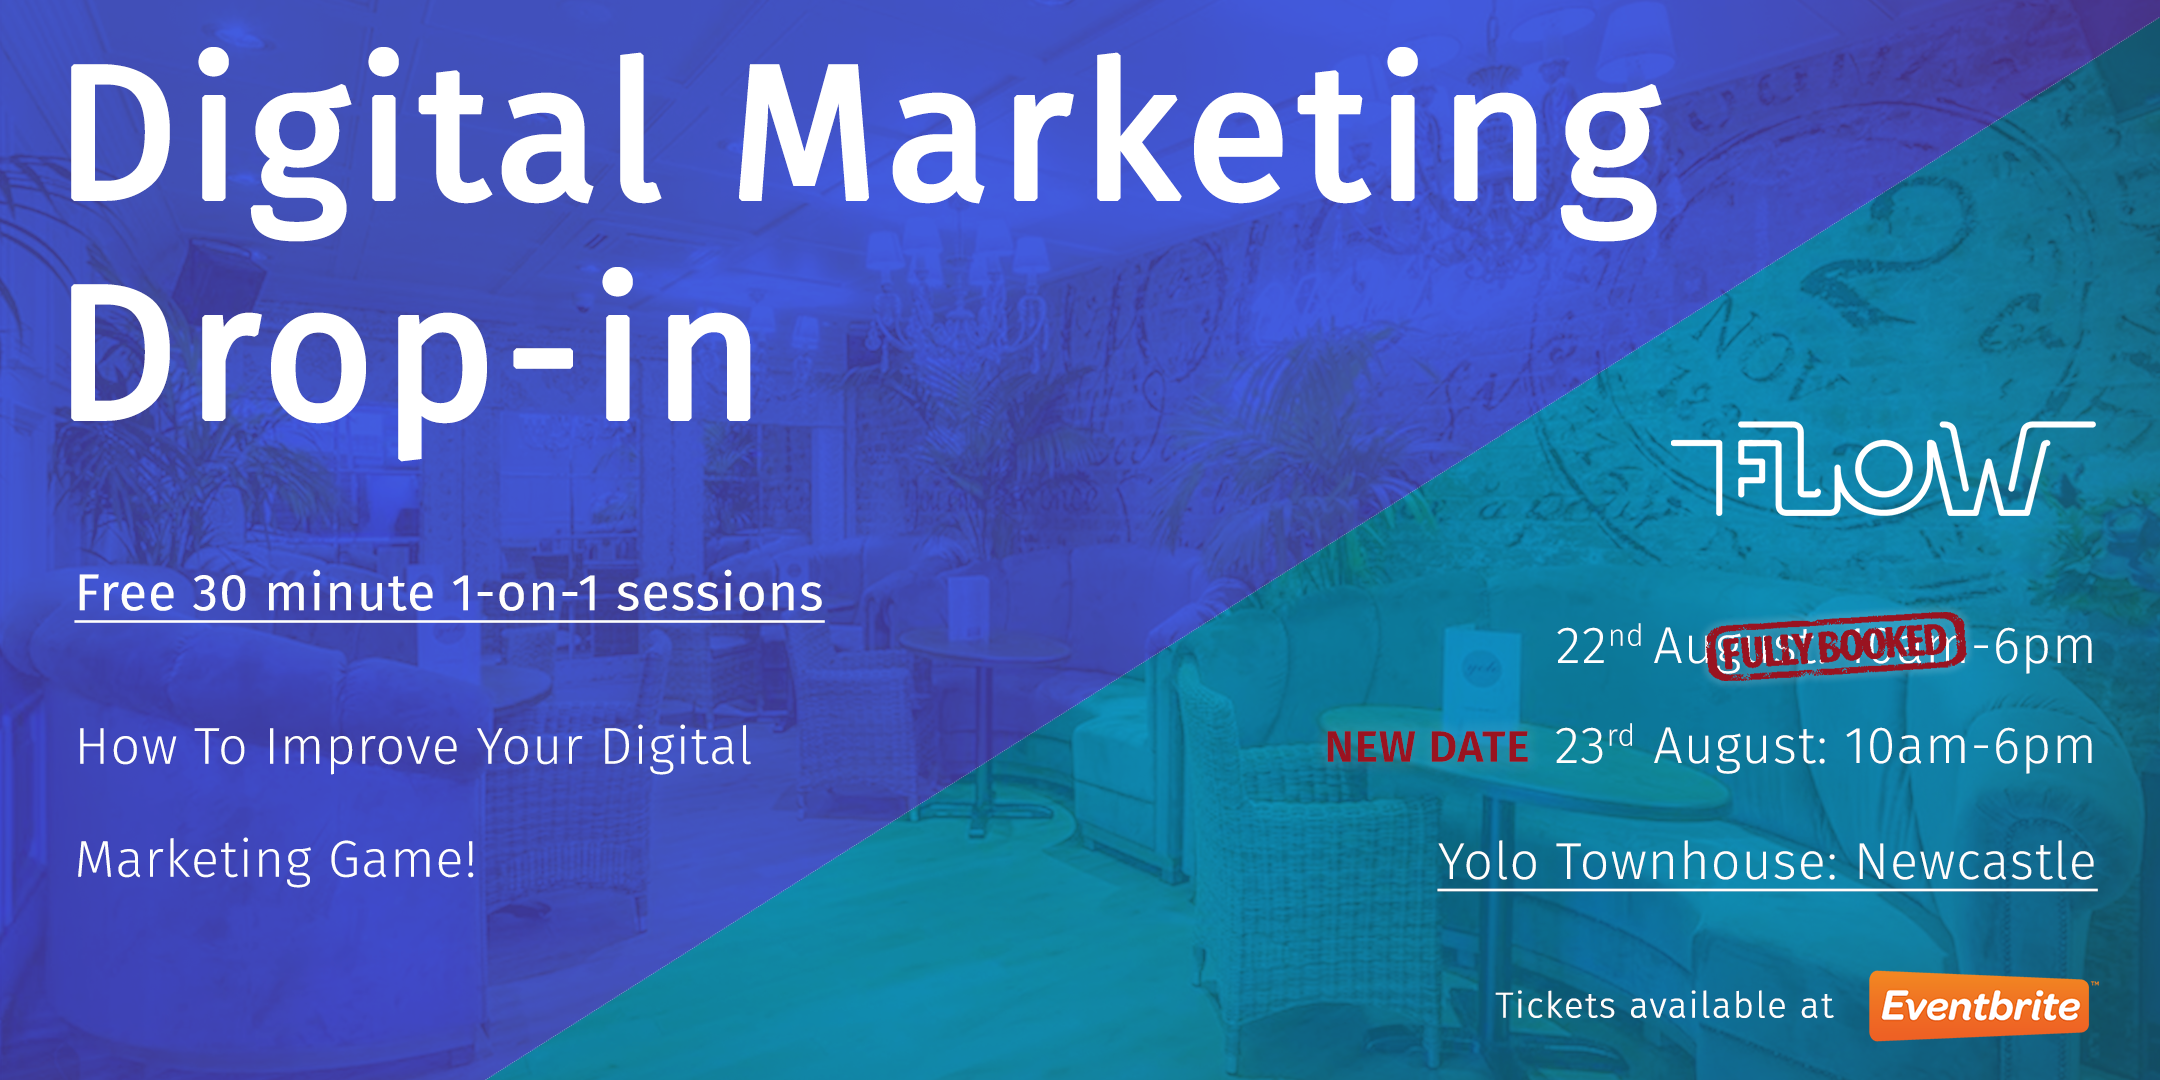 The Digital Marketing Drop-In